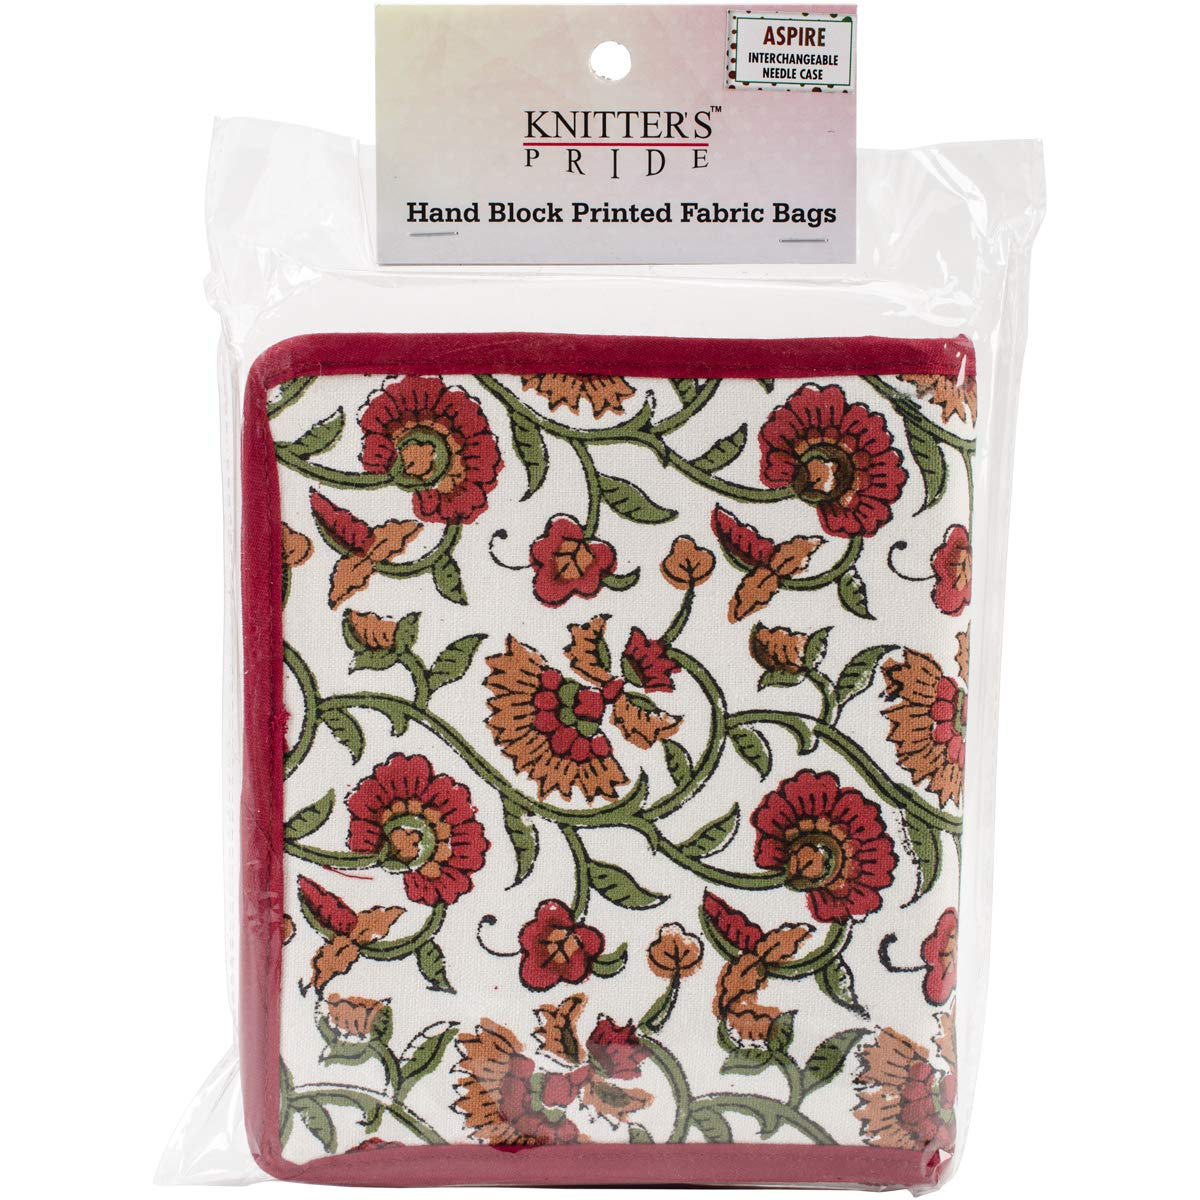 Knitter's Pride 810001 Aspire Interchangeable Needle Case